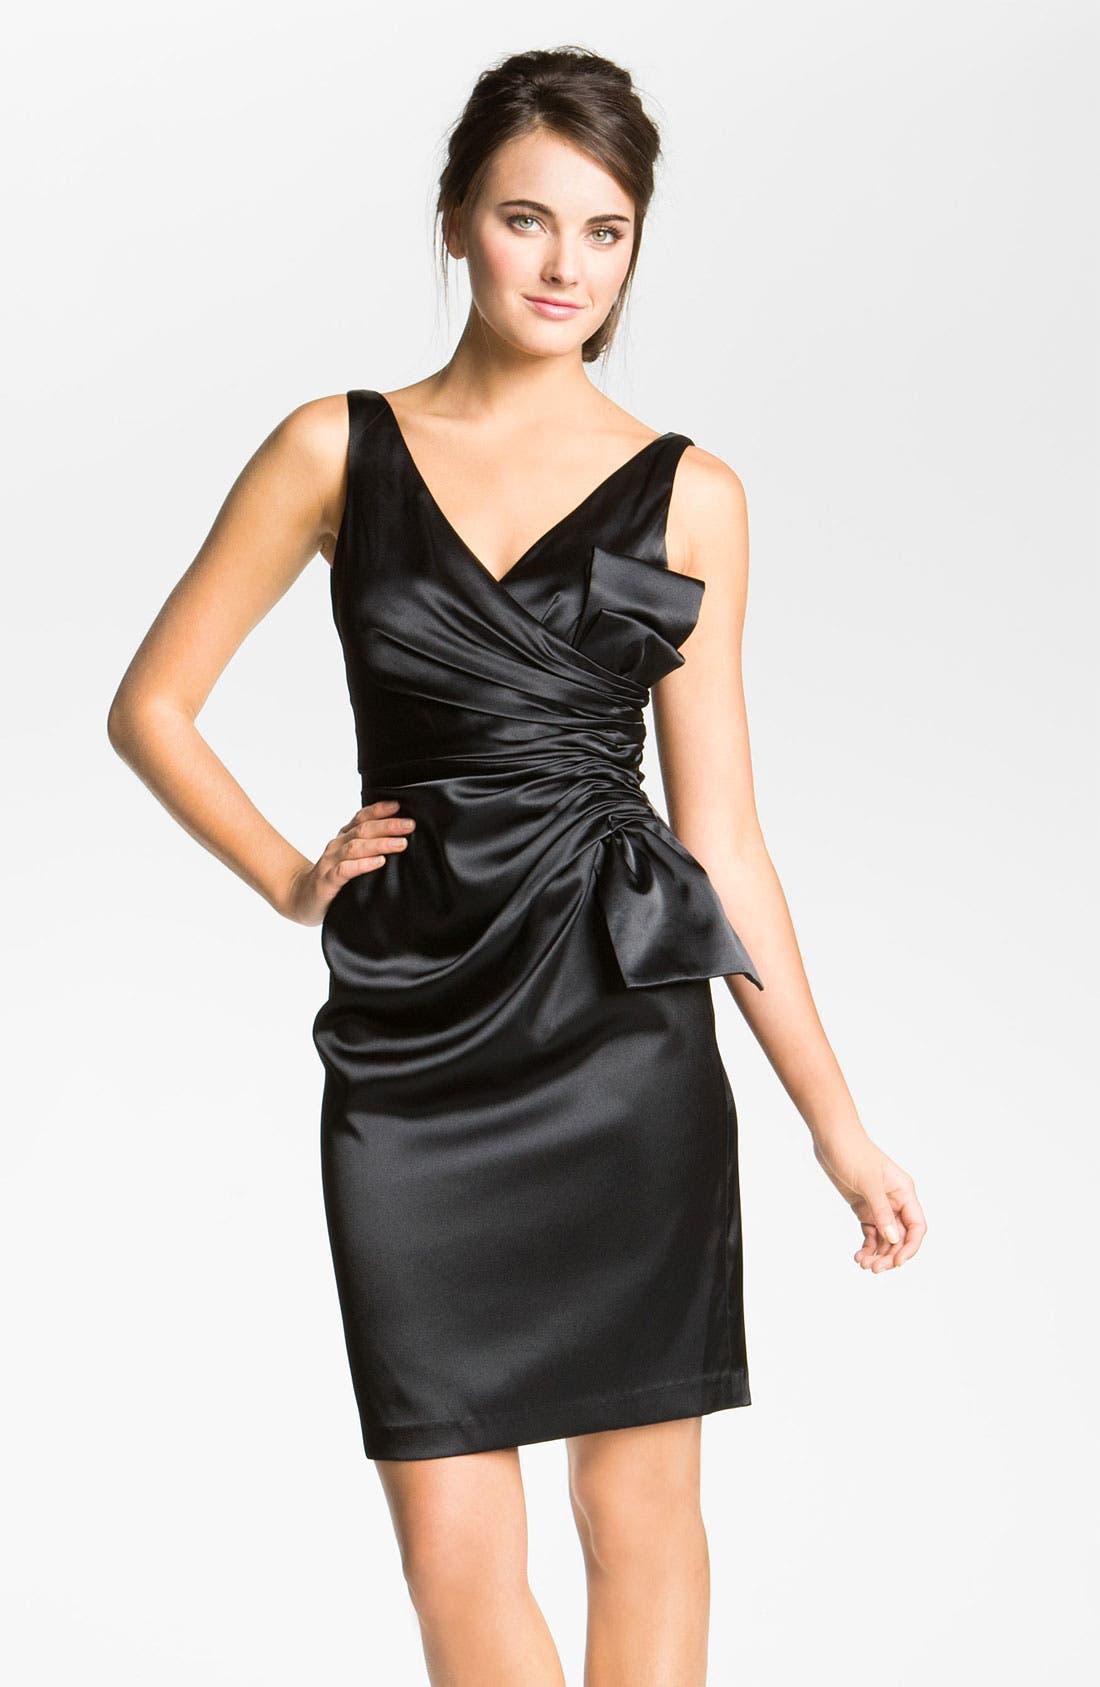 MAGGY LONDON, Side Bow Stretch Satin Sheath Dress, Main thumbnail 1, color, 001